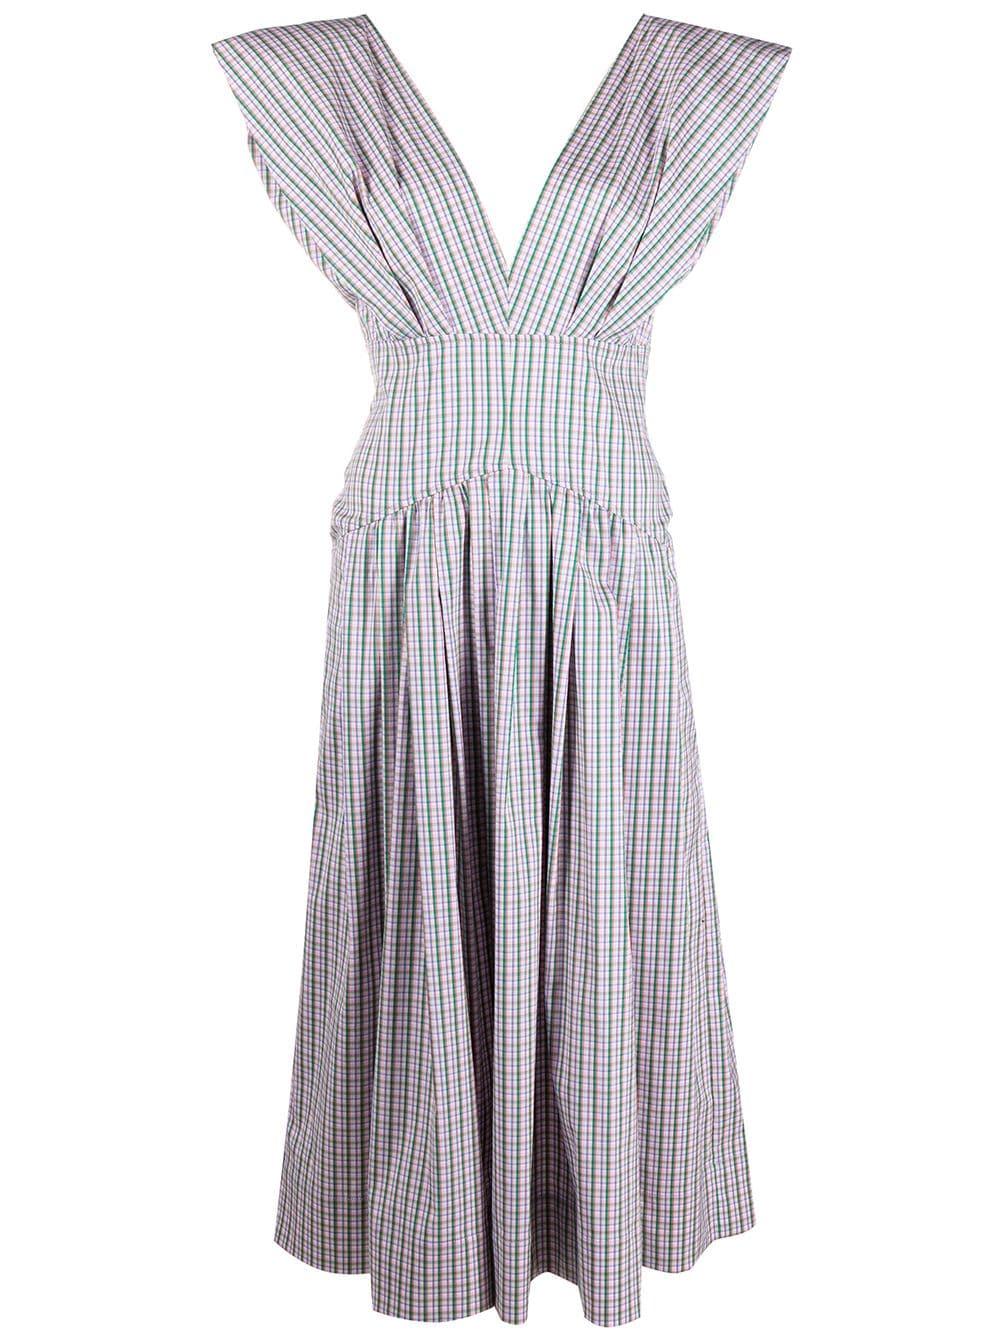 PHILOSOPHY di LORENZO SERAFINI | Dress | A0427736/1393